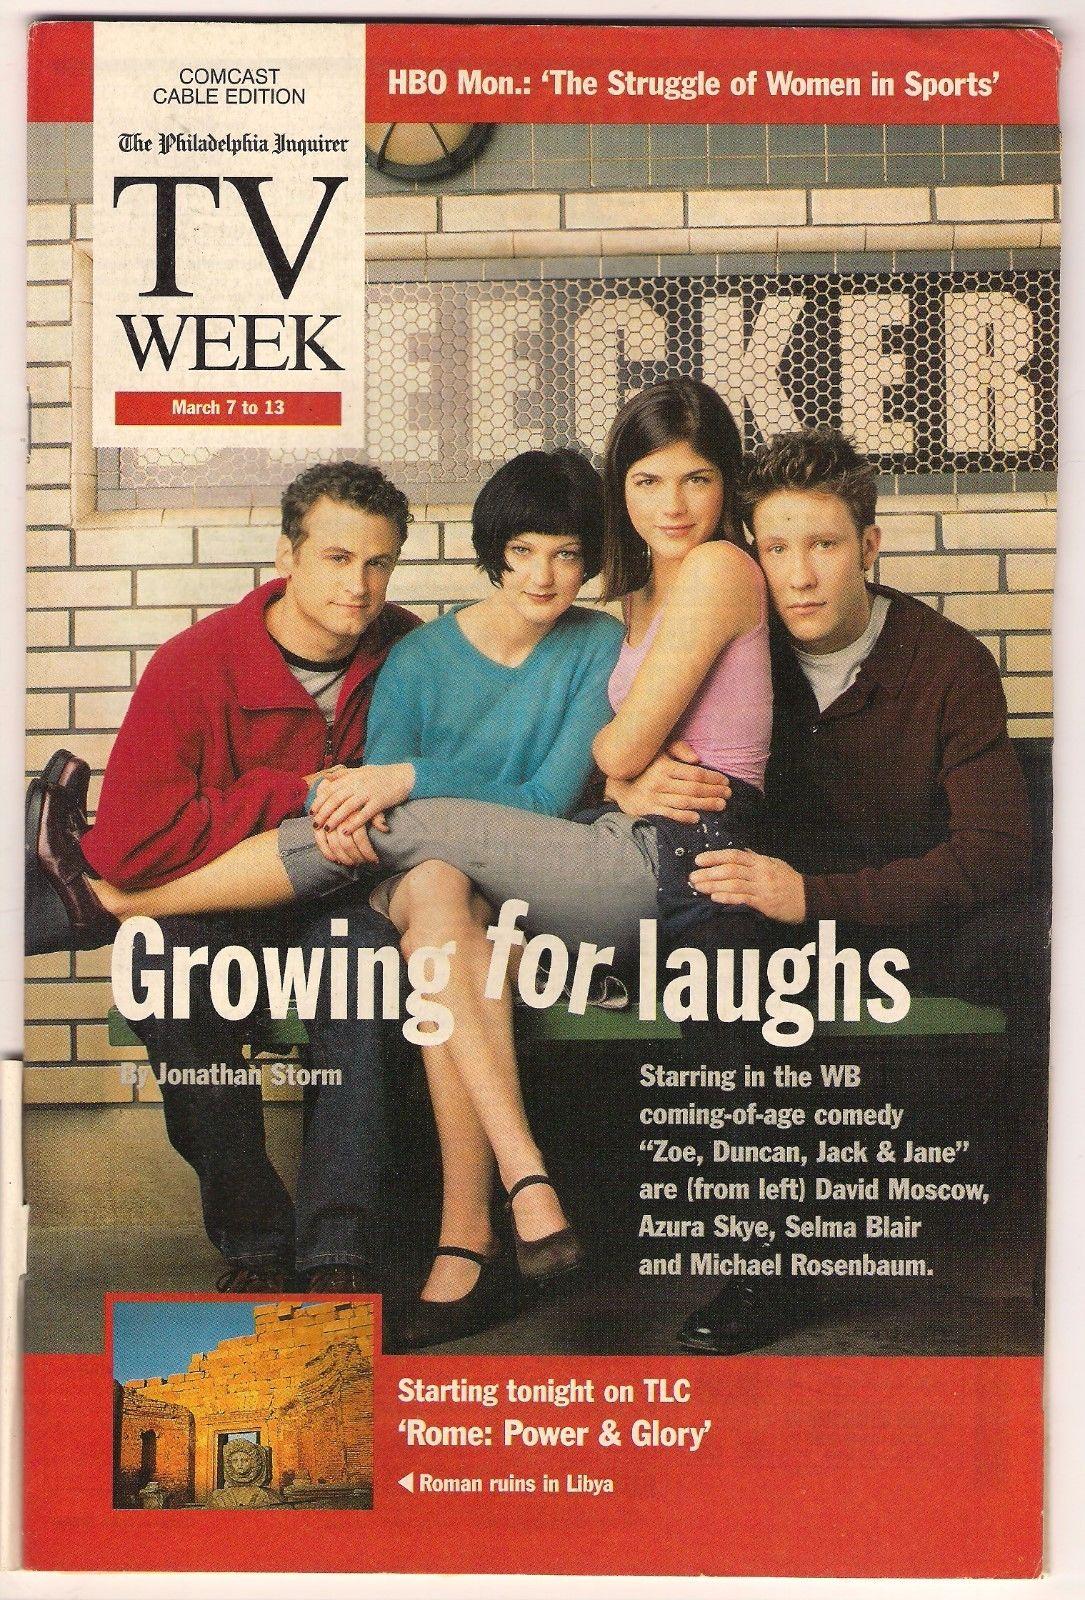 Local_TV_Guide_Zoe_Duncan_Jack_Jane_Cast_1999_Philadelphia_Inquirer